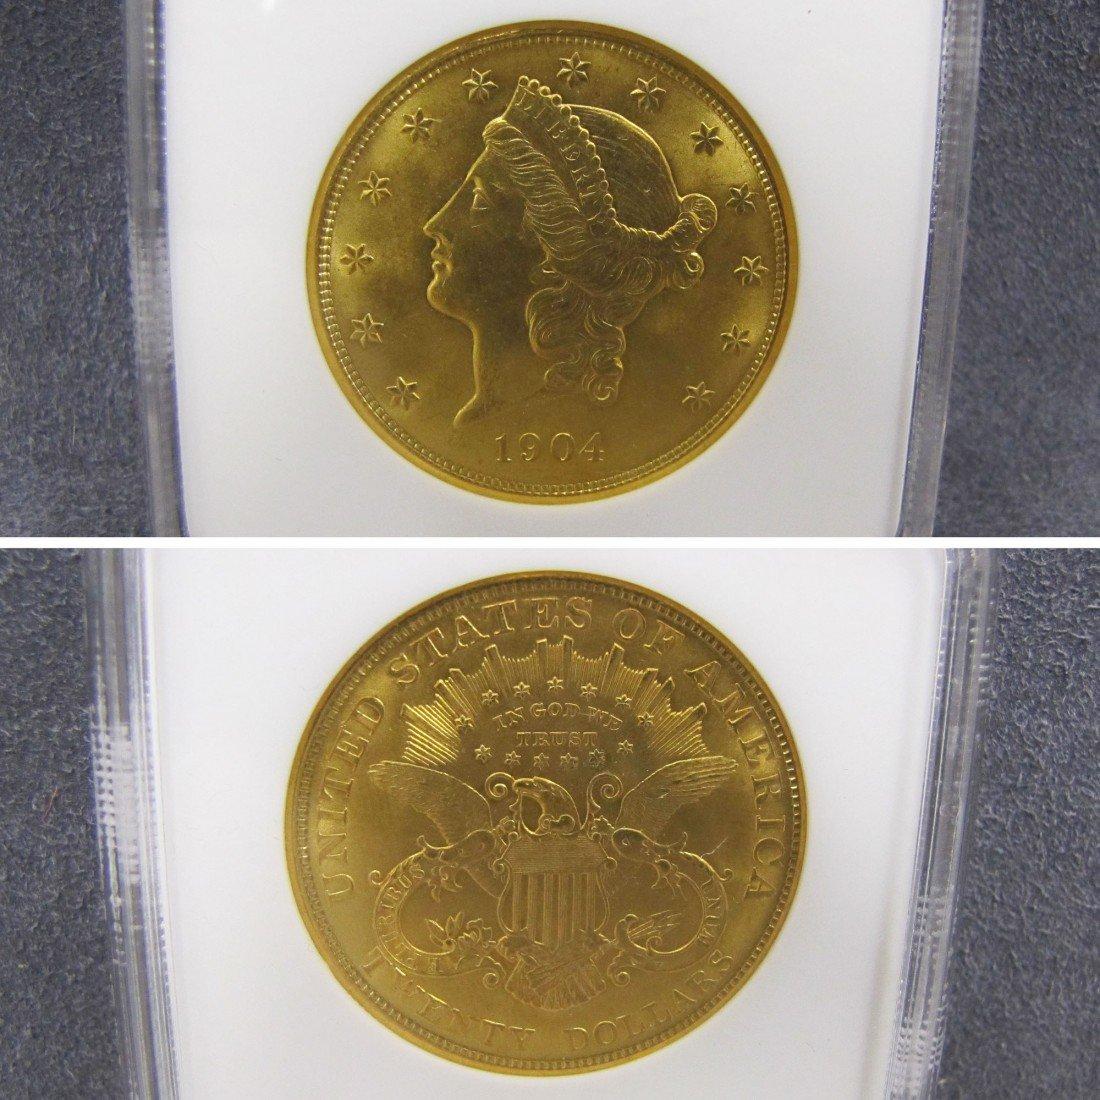 17: US 1904 TWENTY DOLLAR LIBERTY GOLD (MS-63 NGC)